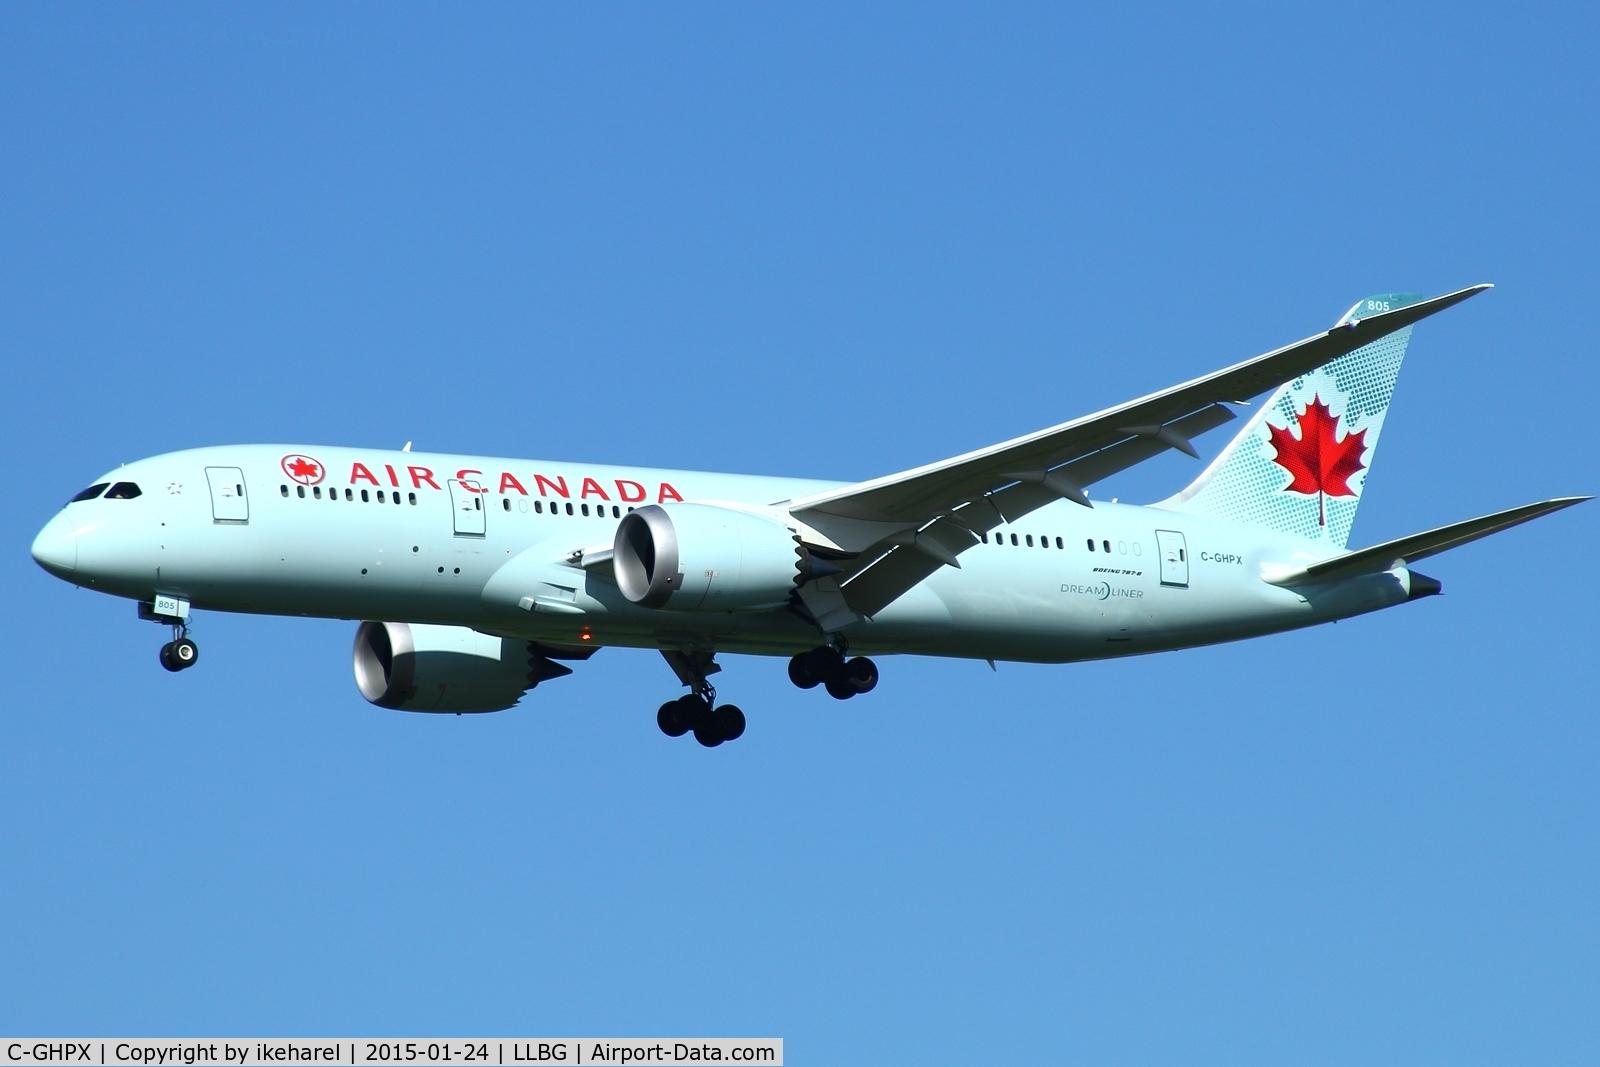 C-GHPX, 2014 Boeing 787-8 Dreamliner C/N 35261, Fly in from Toronto Canada, landing on runway 21.